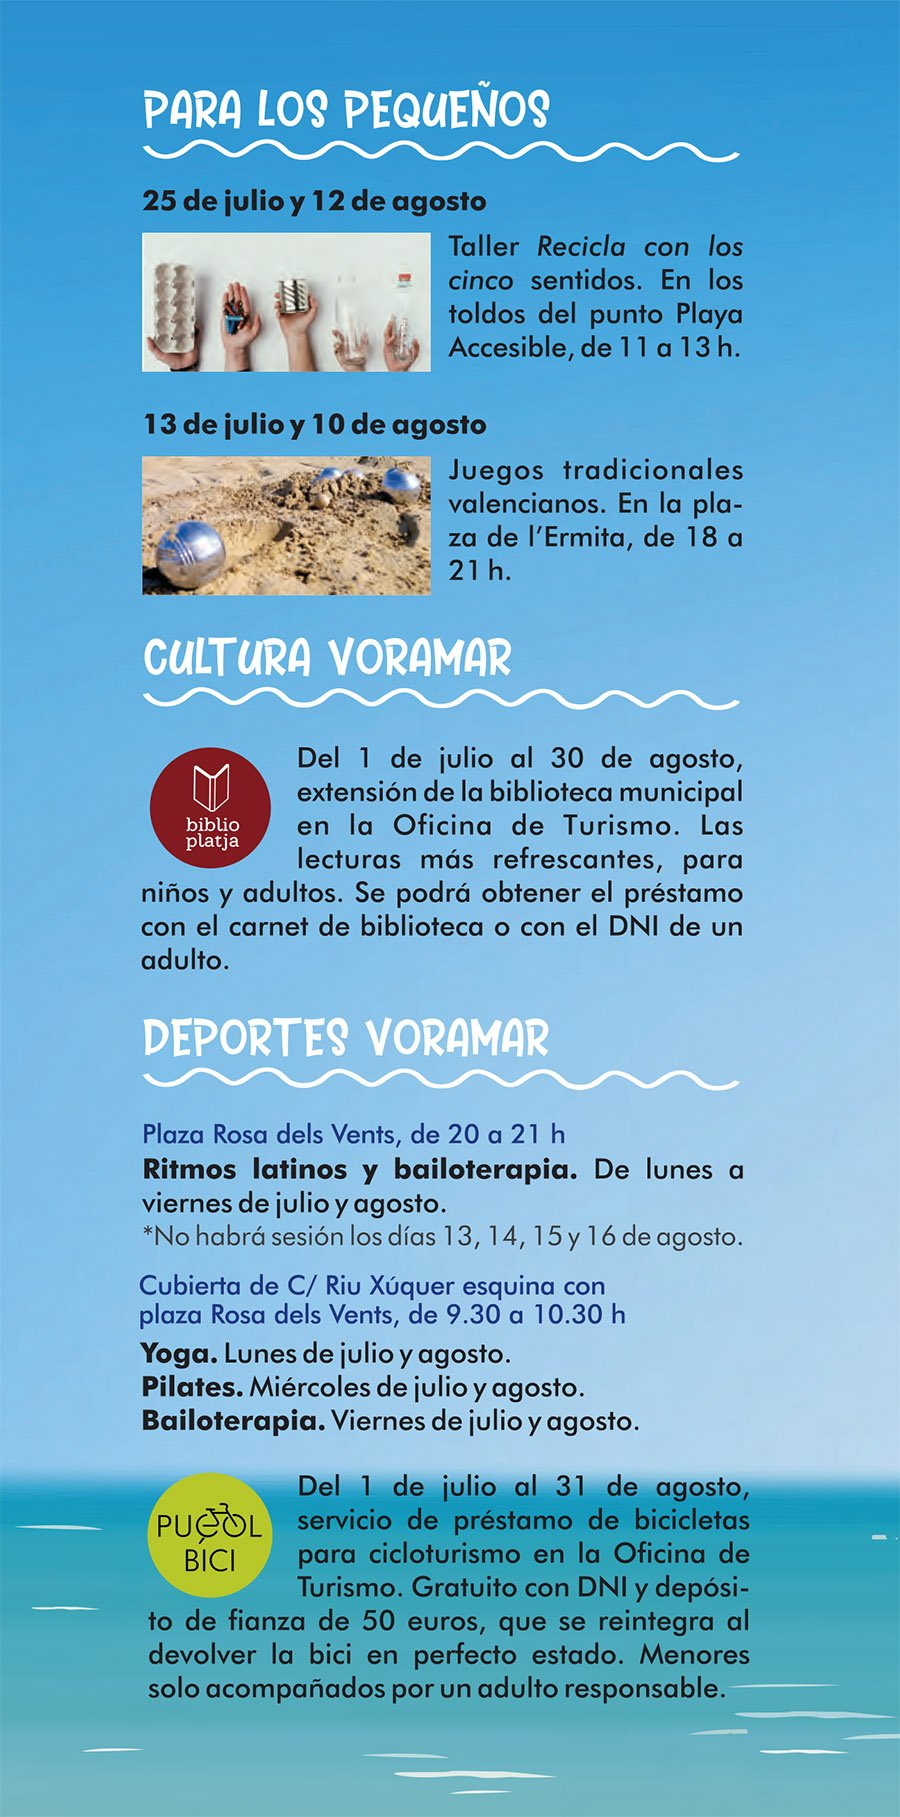 Verano Playa Puçol 2019 Programacion 2